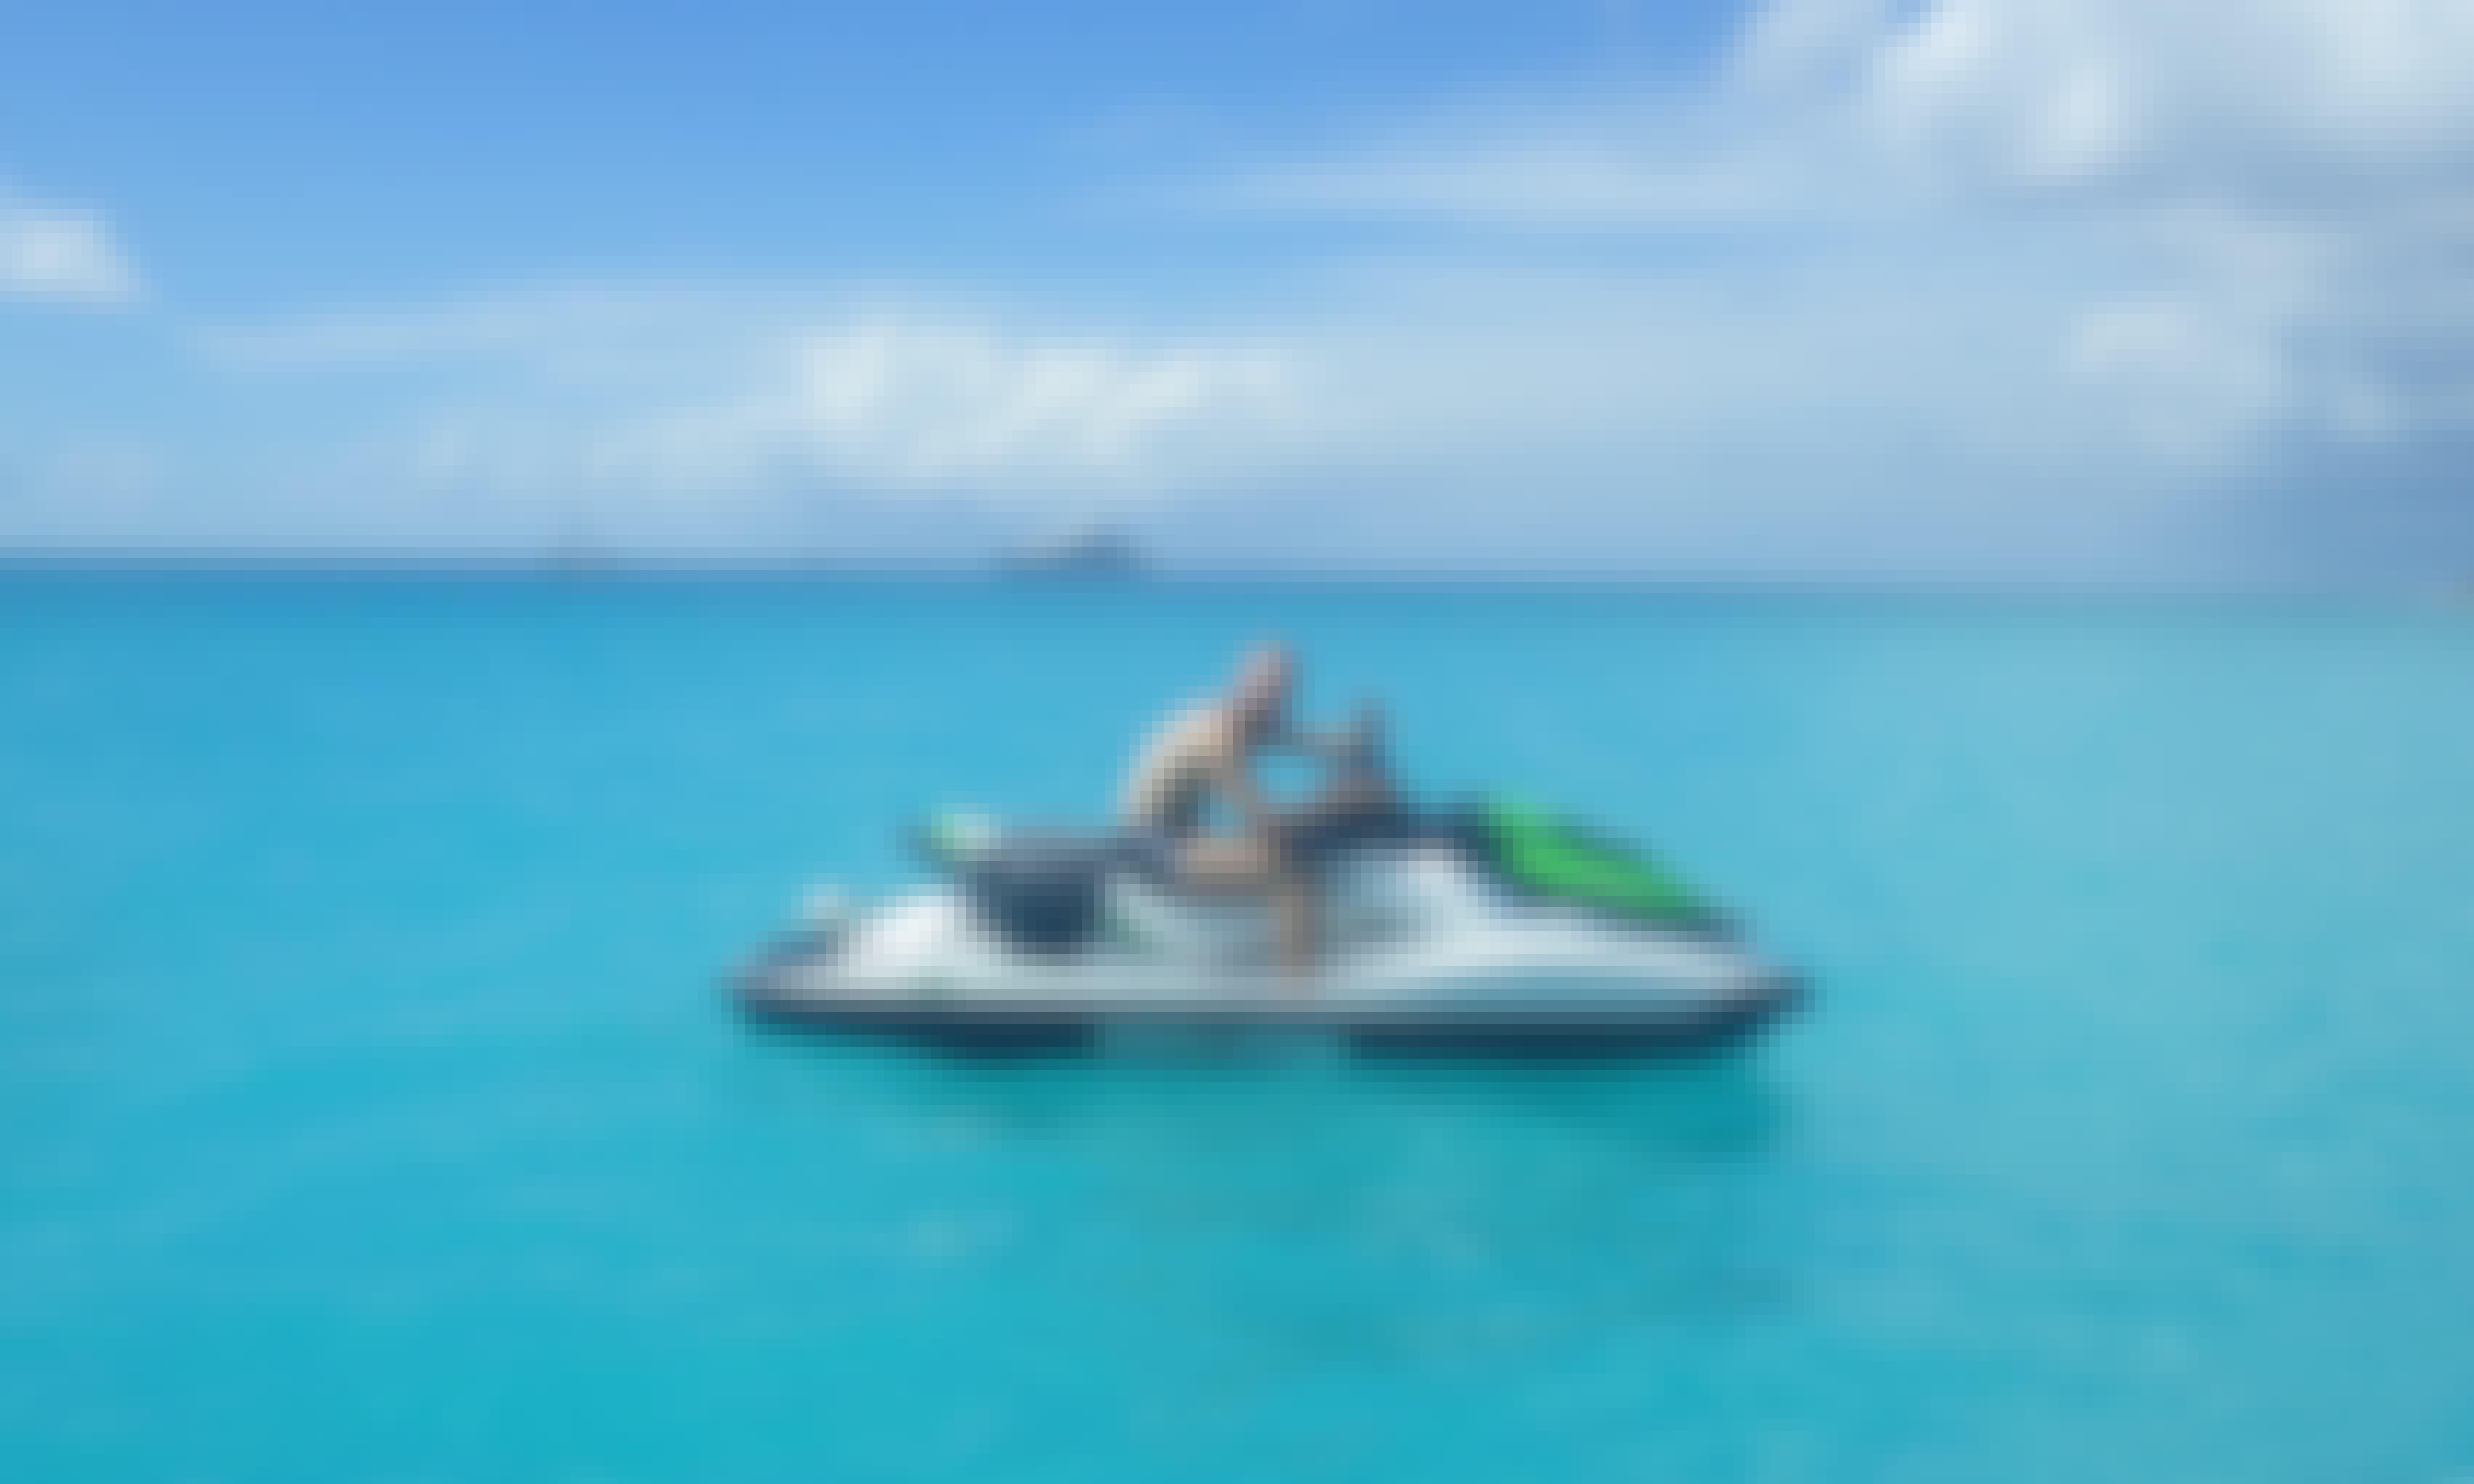 Rent a Jet Ski in Marigot, Saint Martin